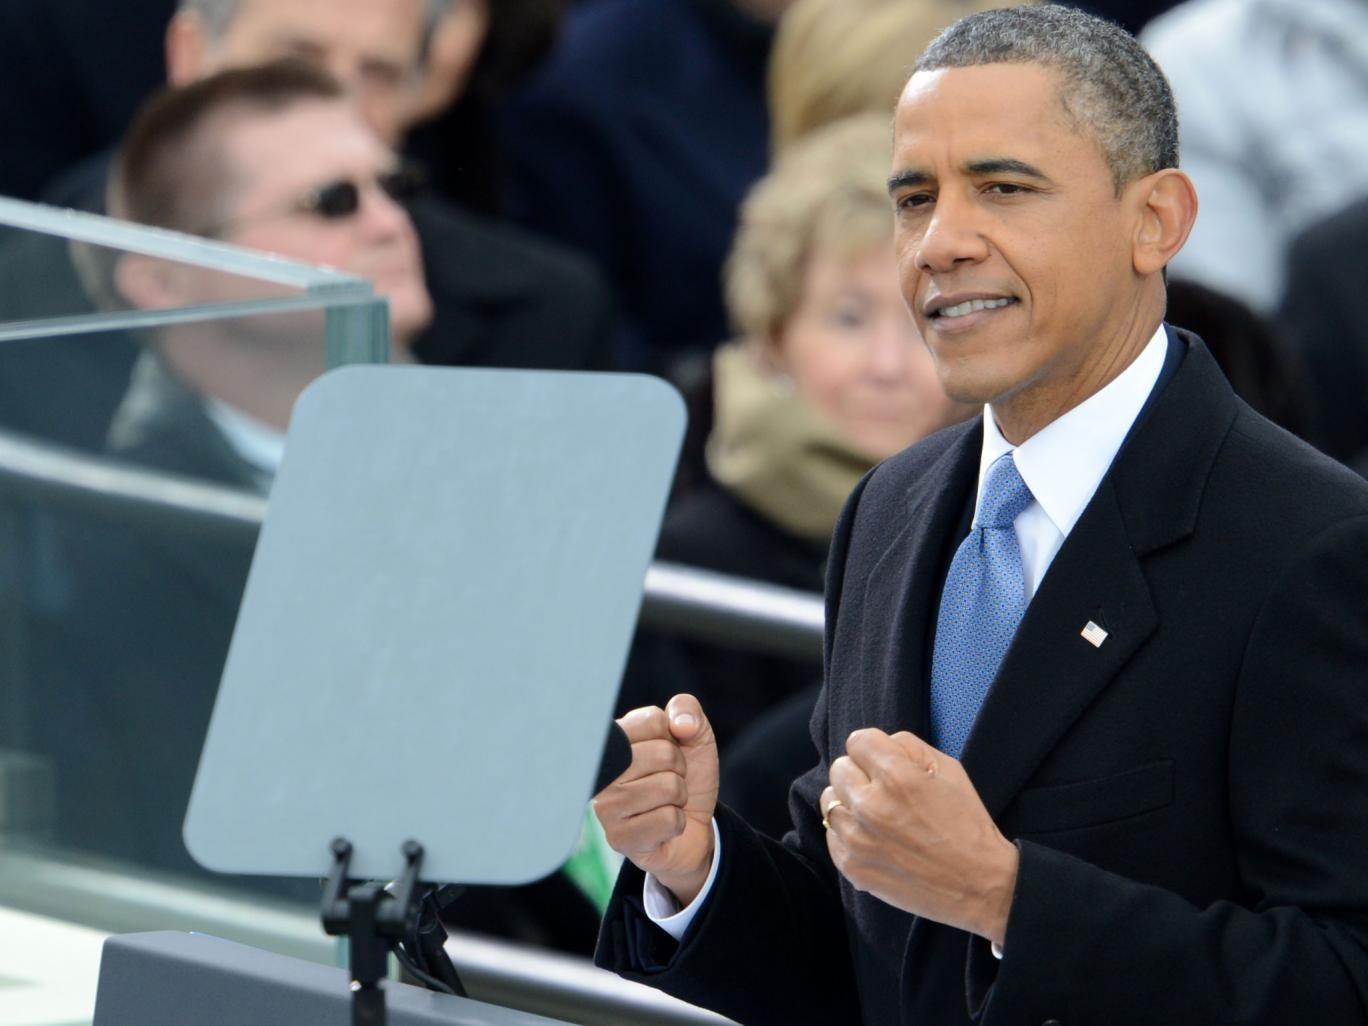 Barack Obama delivers remarks after taking the oath of office